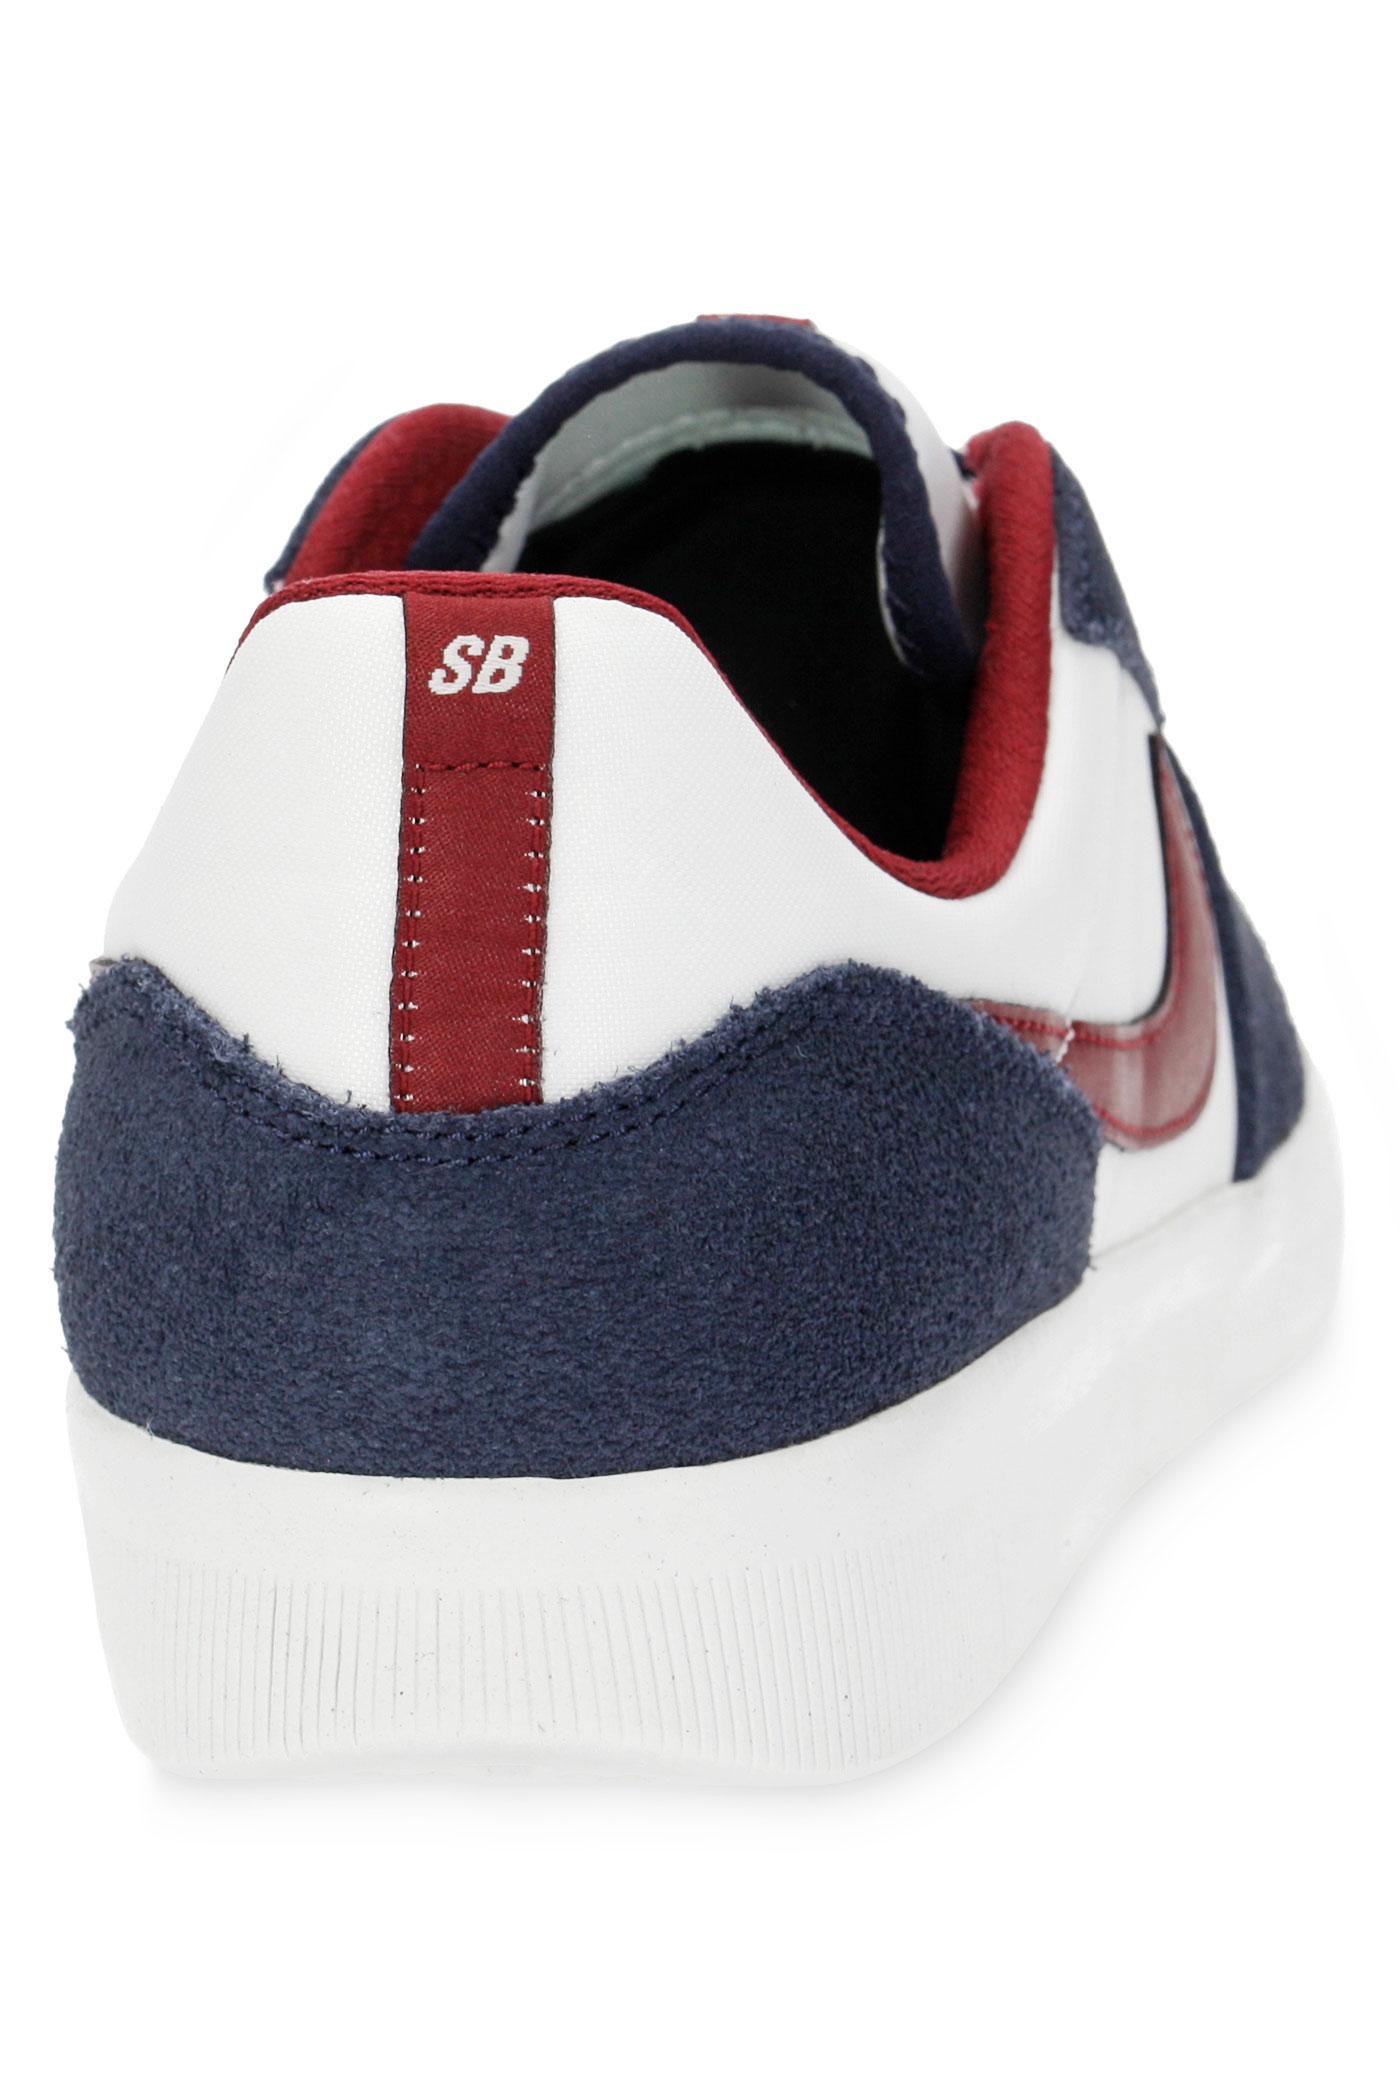 Red Team Nike Chaussureobsidian Sb Classic OZTPikXu